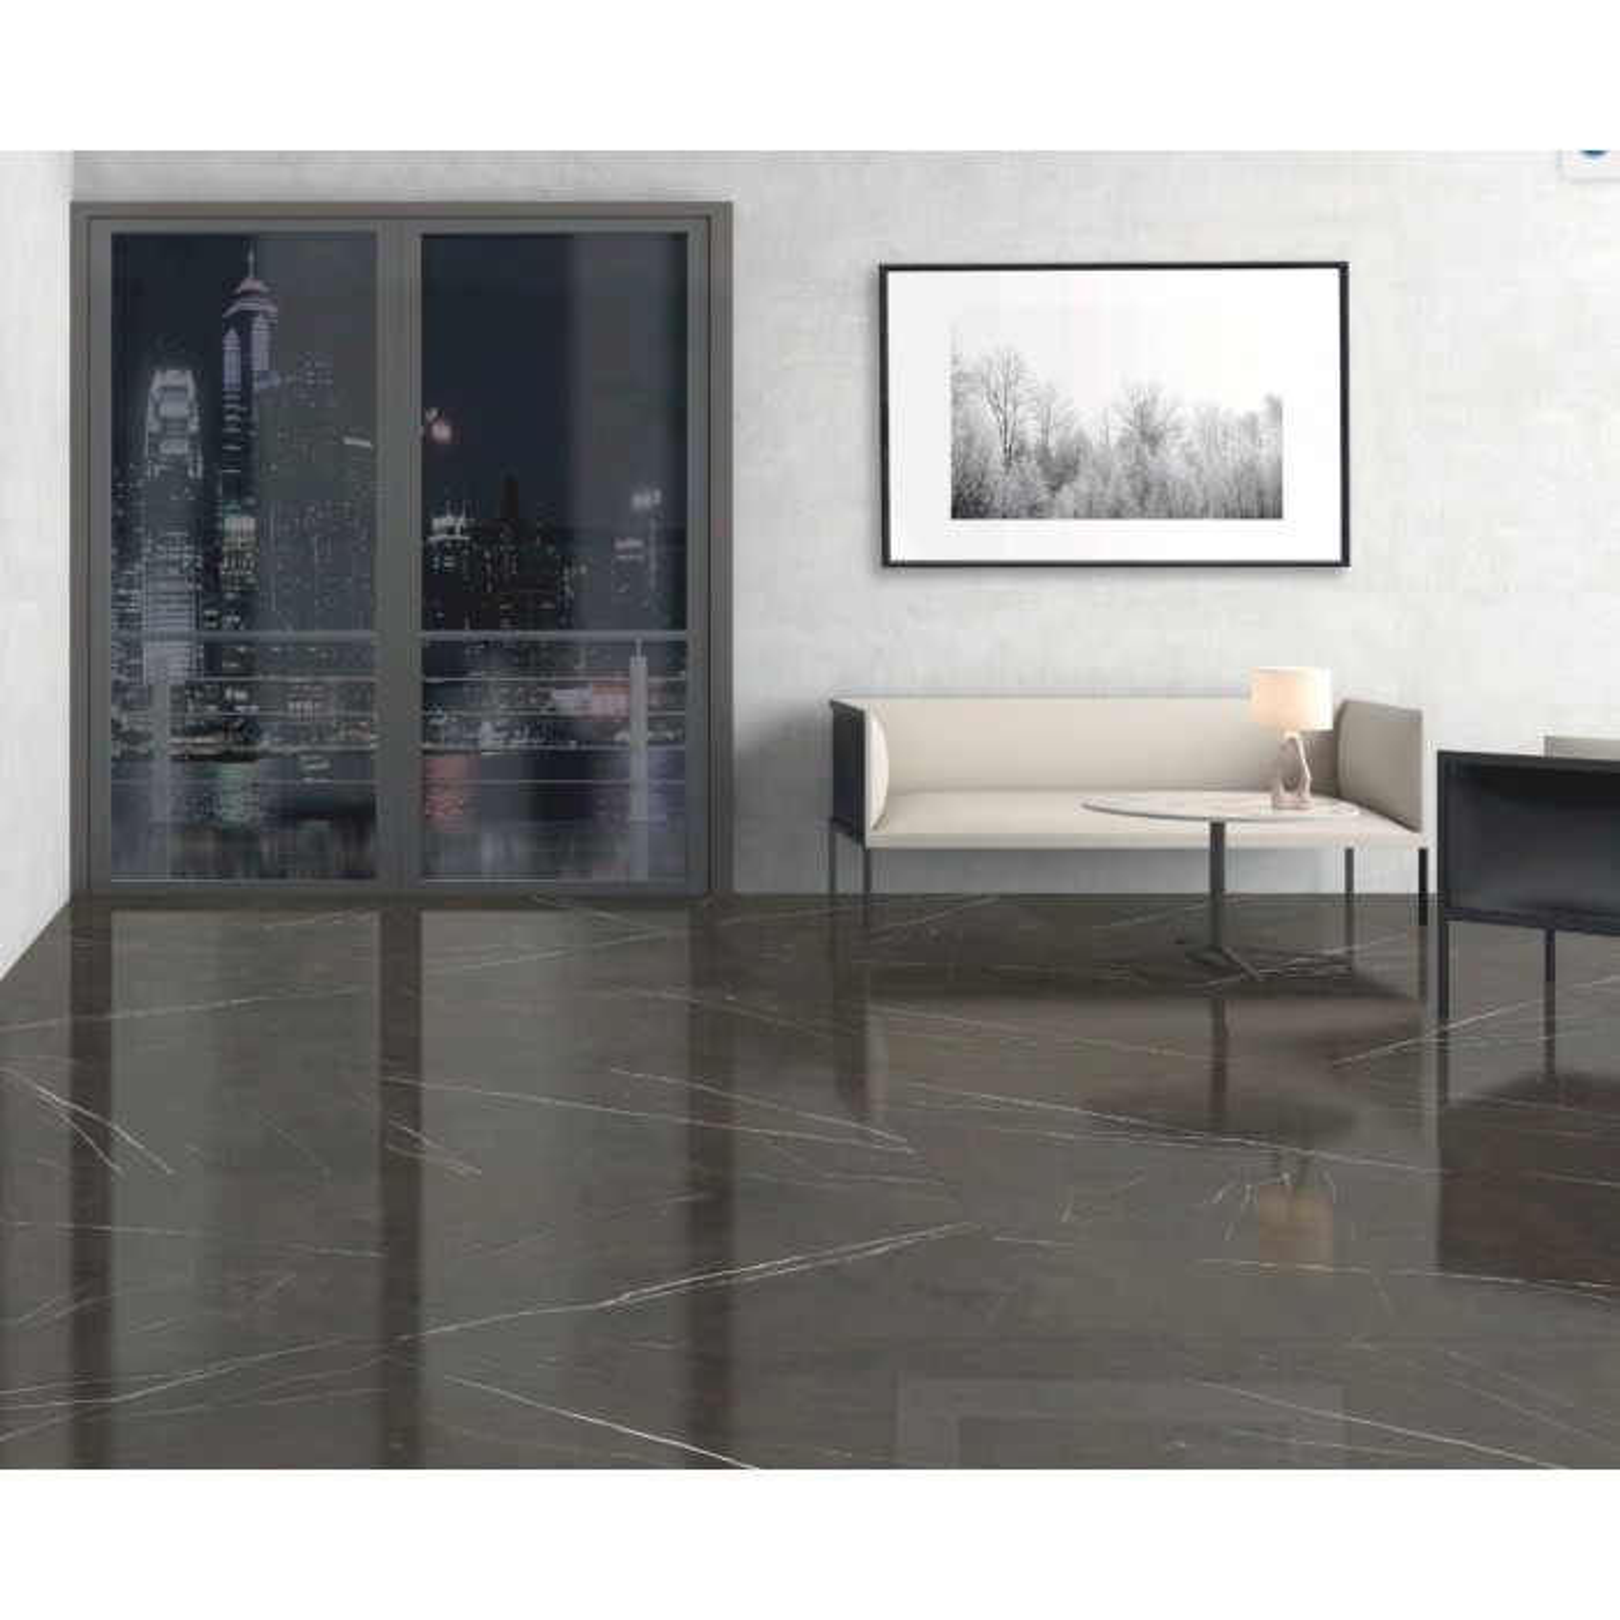 Carrelage gr s c rame effet marbre pietra grey gris chaud for Carrelage marbre gris